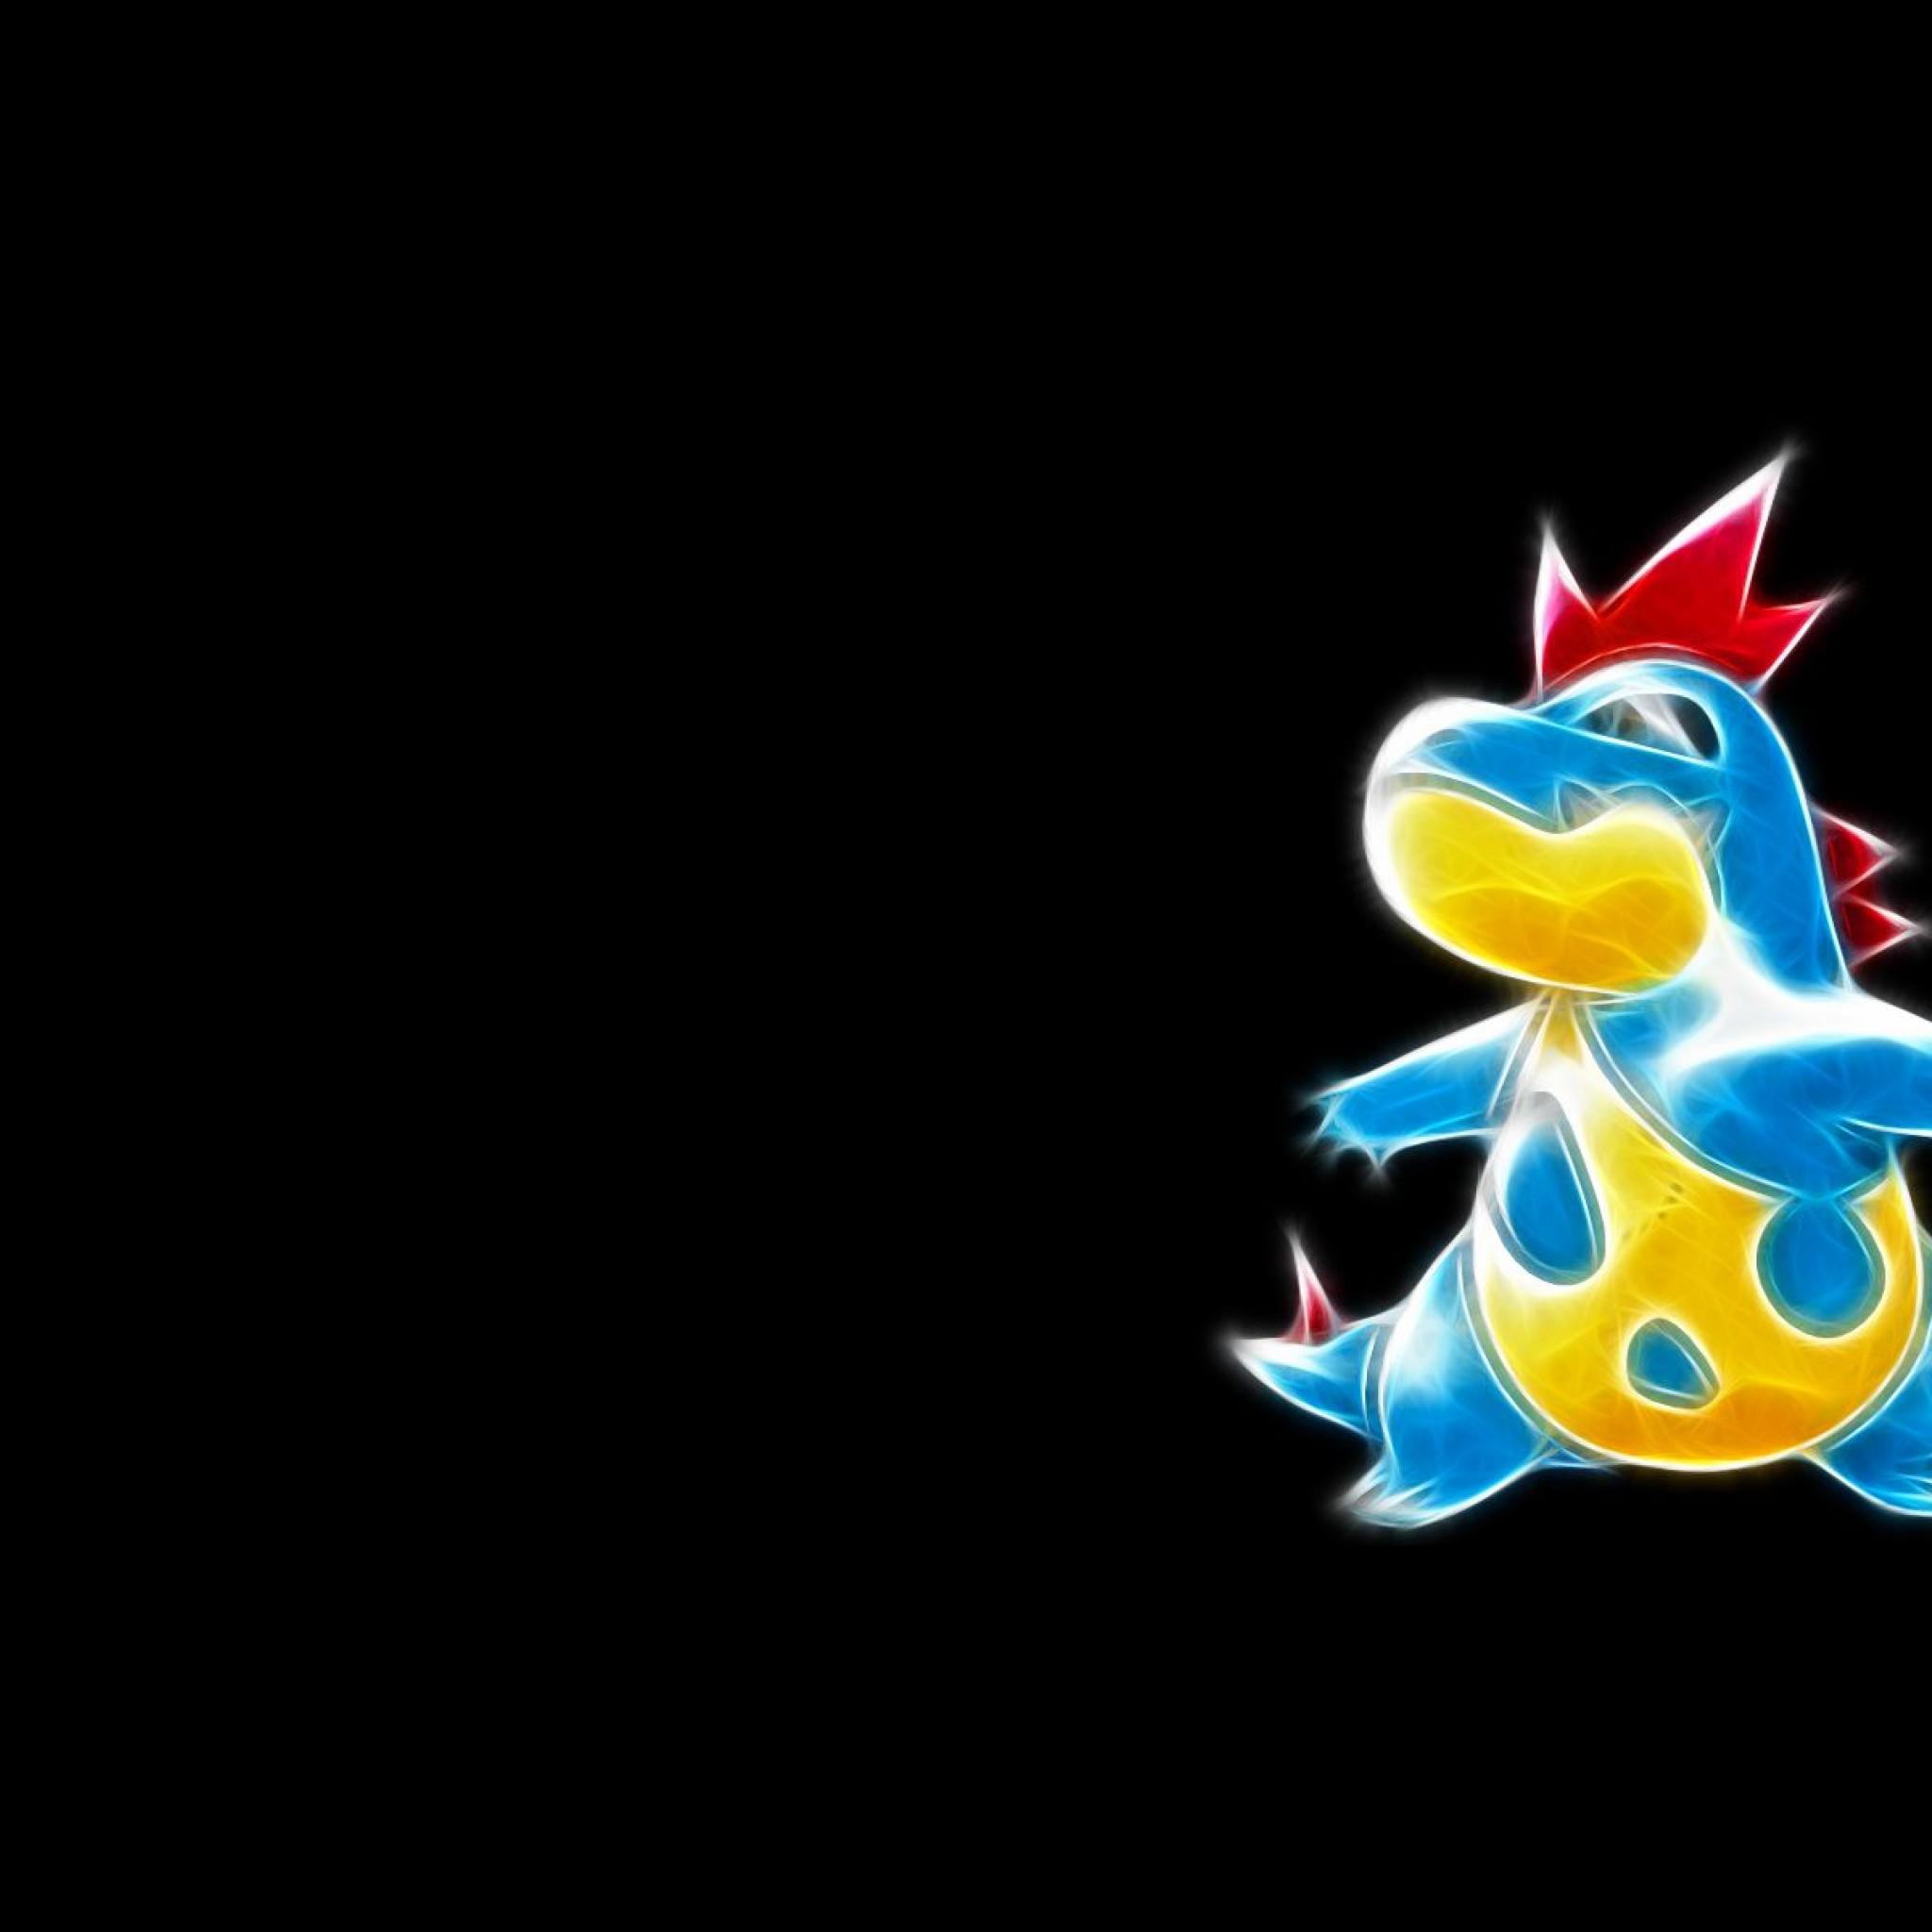 Pokemon Iphone Backgrounds Picture Wallpaper Pics 5078  PicTheWallcom 2048x2048